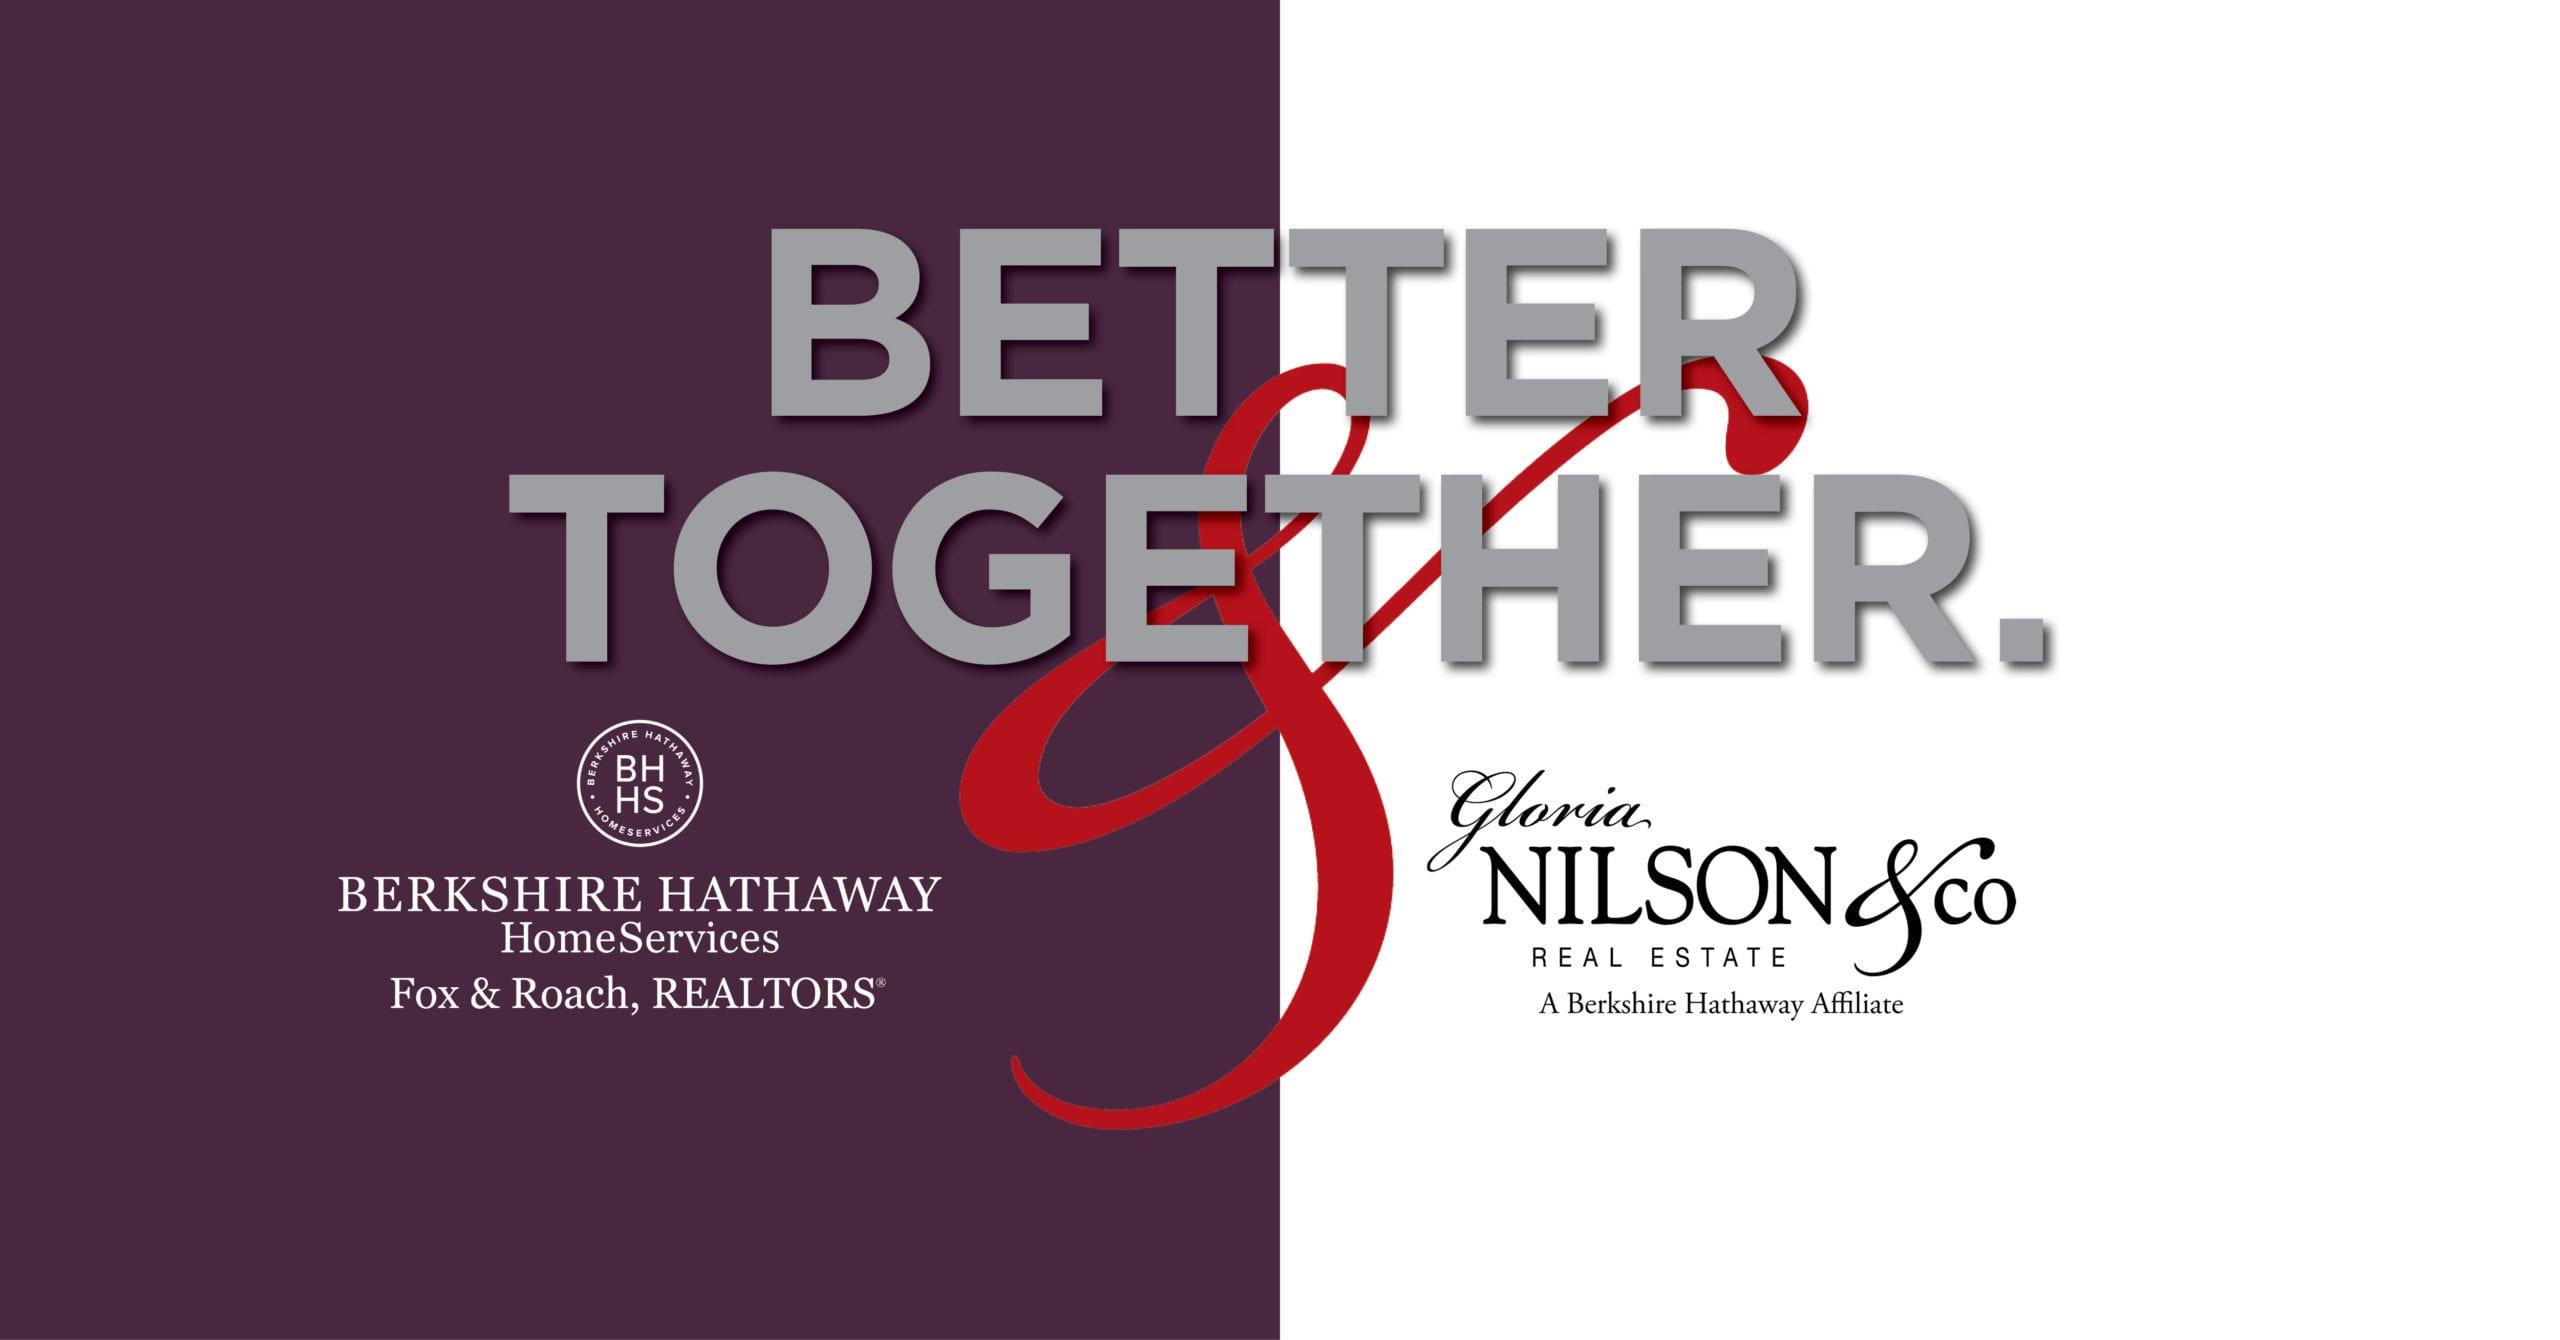 Berkshire Hathaway HomeServices Fox & Roach, REALTORS® and Gloria Nilson & Co. Announce Merger